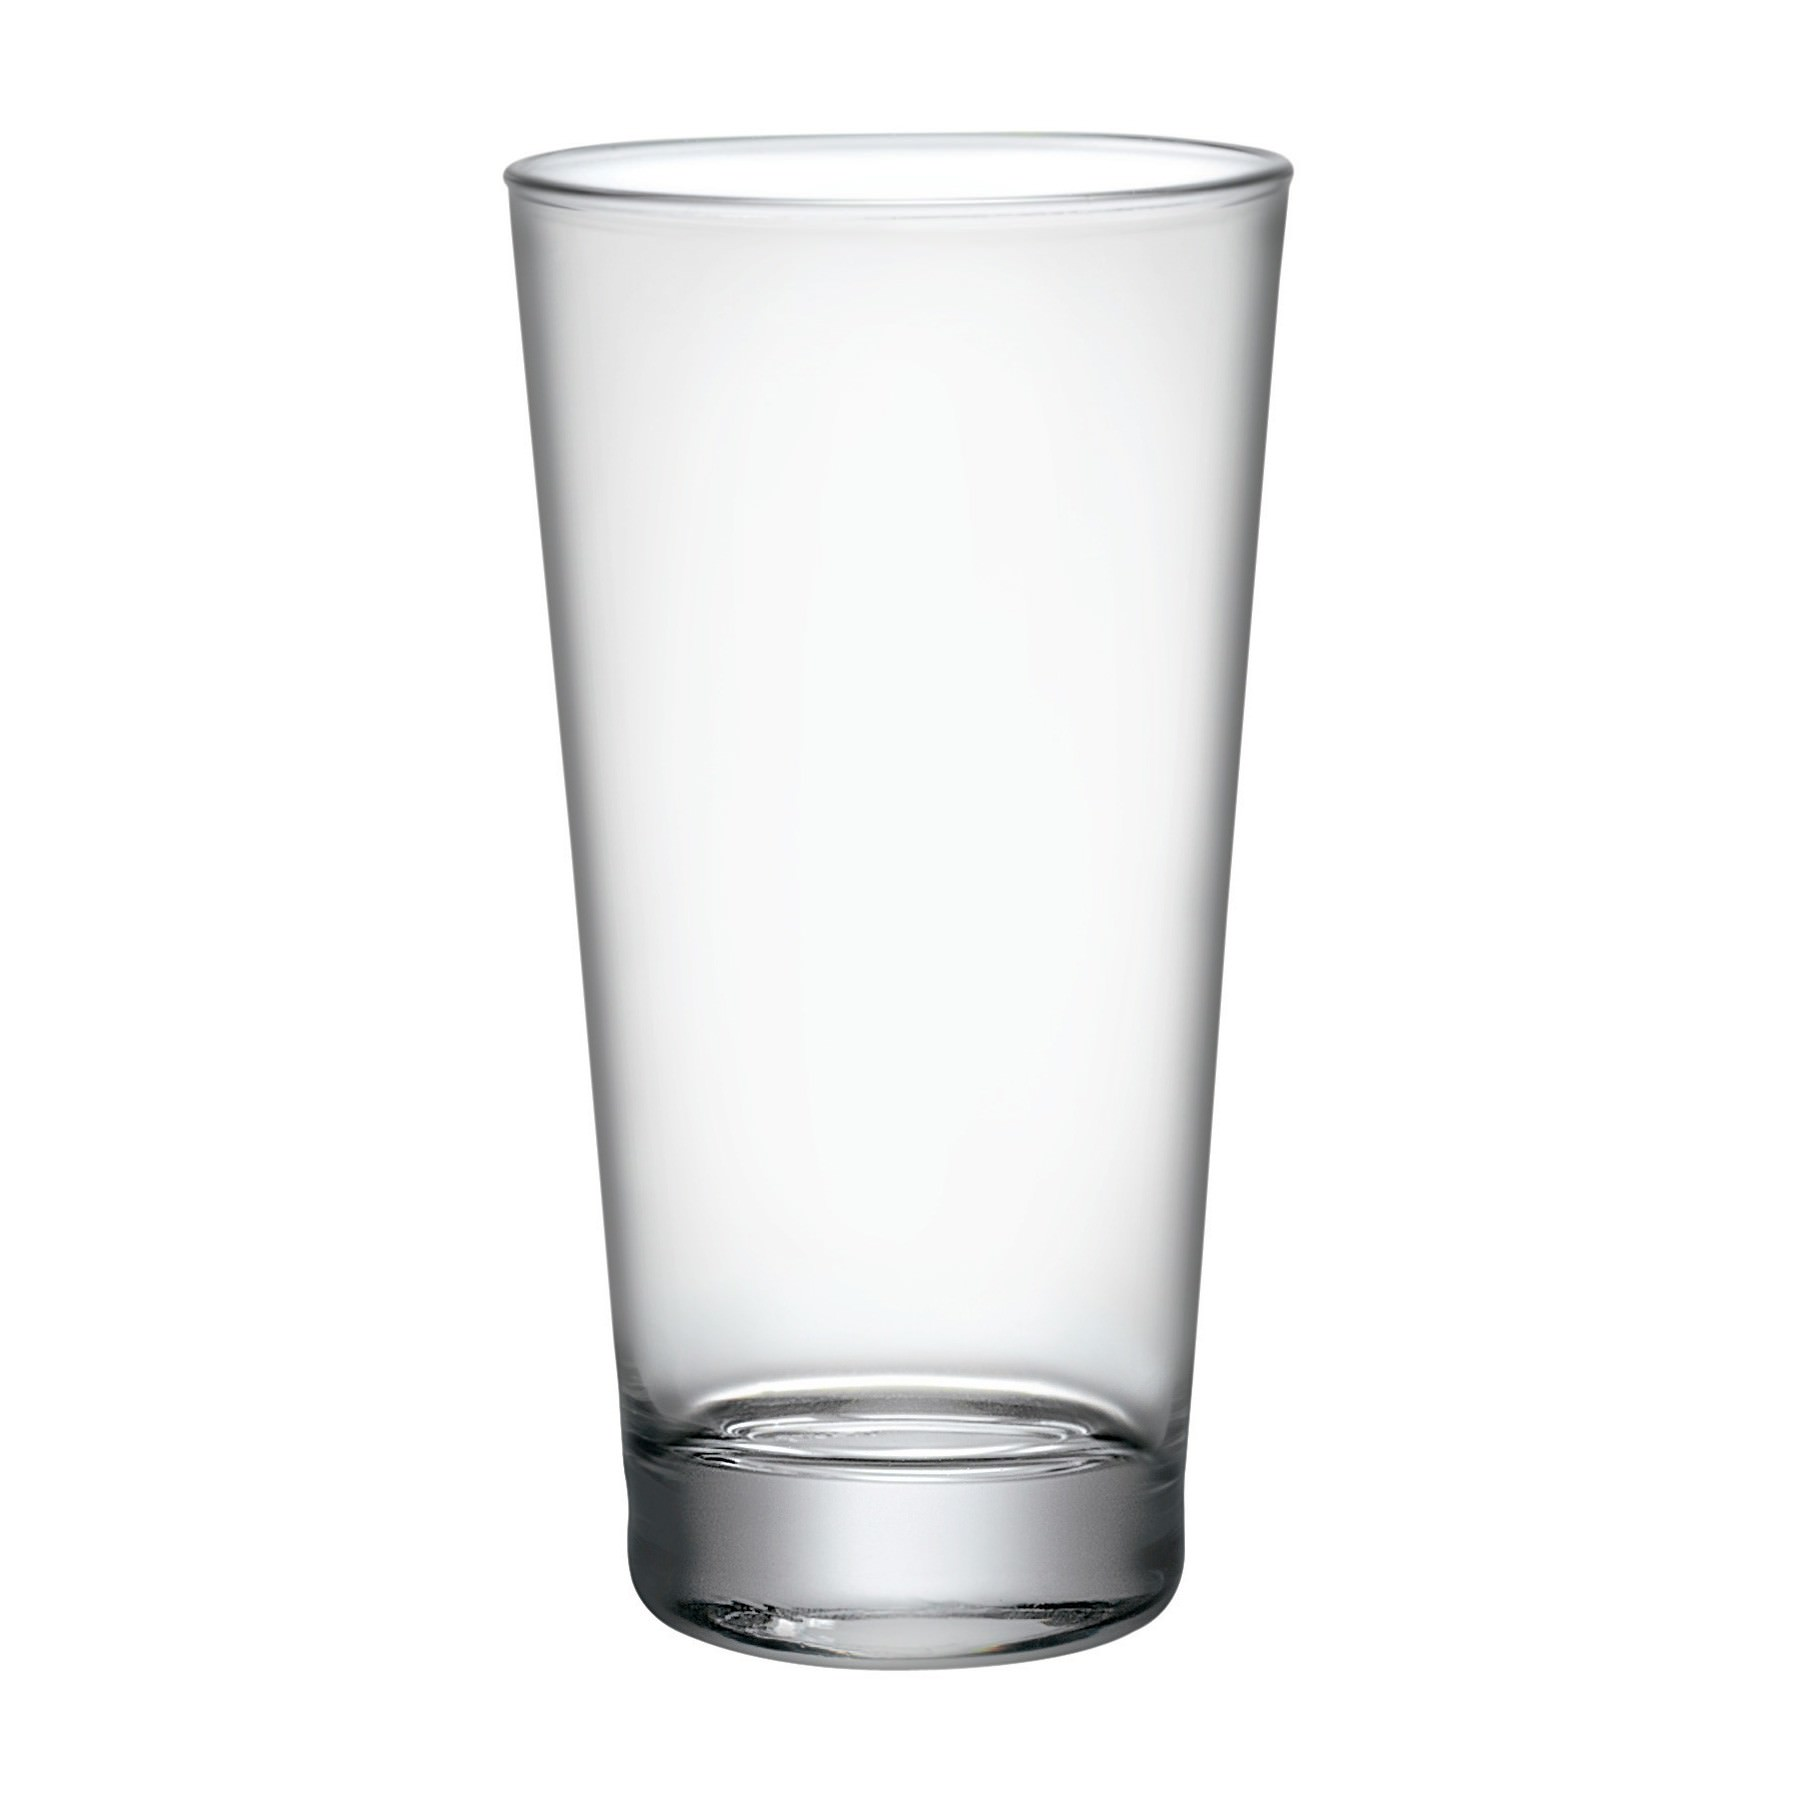 Bormioli Rocco Sestriere High Ball Glasses, Set of 6